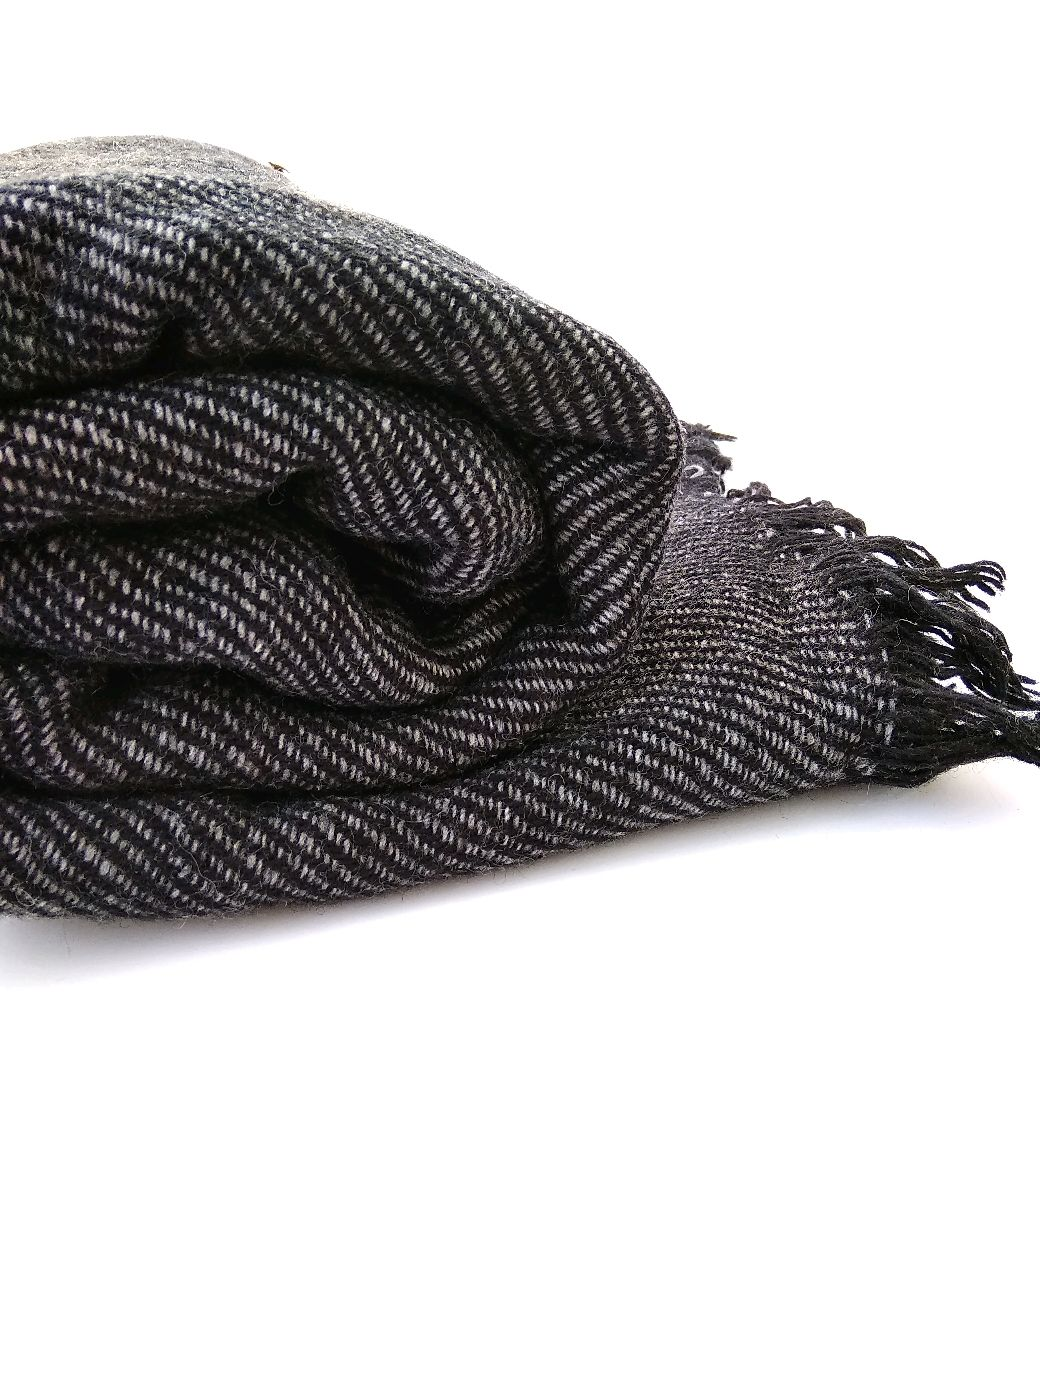 Палантин-шаль из шерсти темно серый, Палантины, Санкт-Петербург,  Фото №1